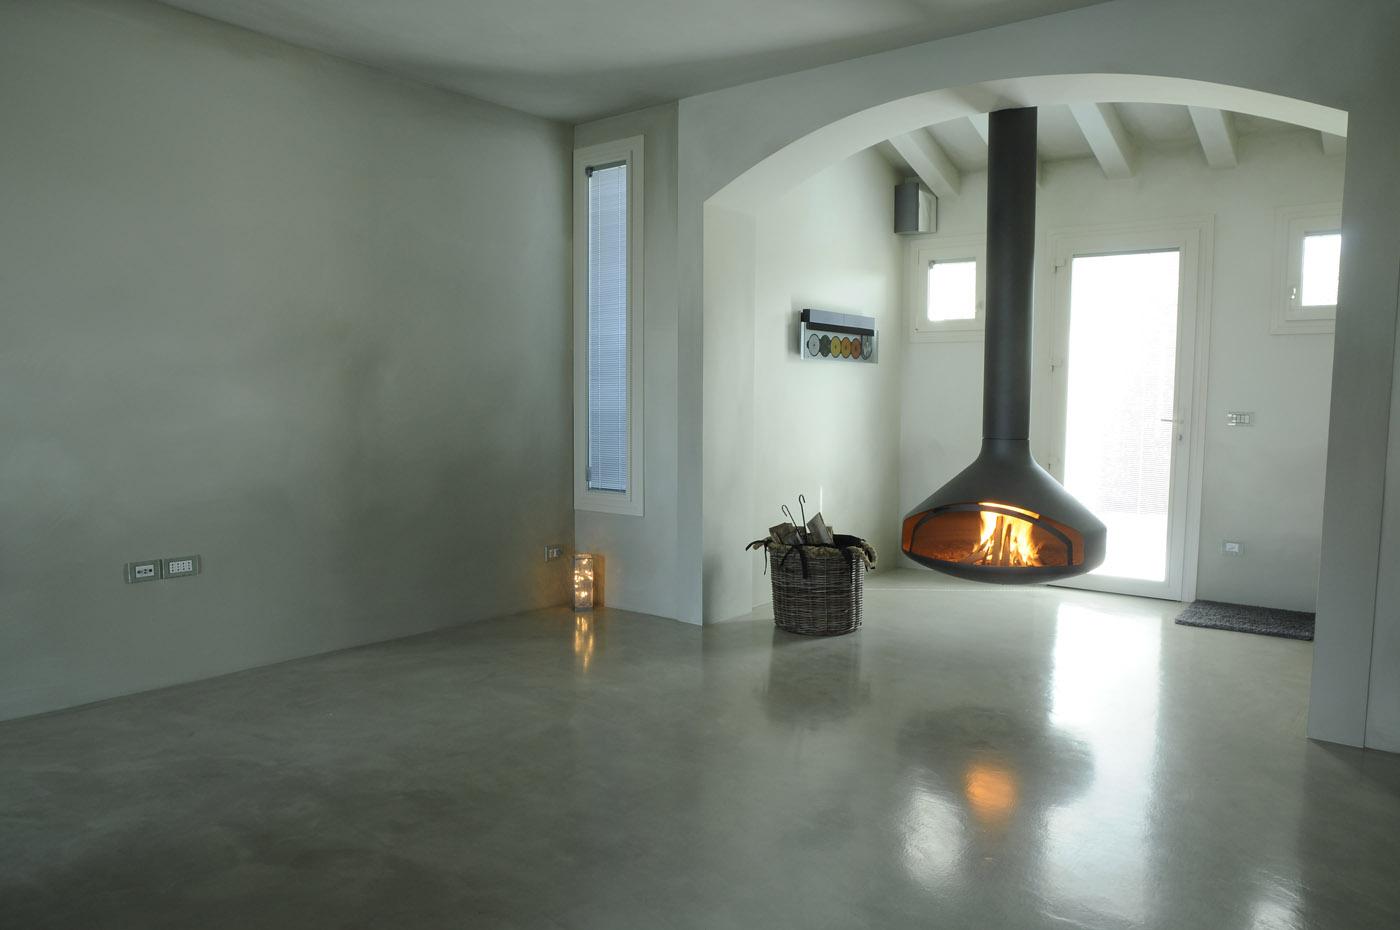 Pavimenti sottili effetto resina parquet pietra leef - Pavimenti per interni moderni ...